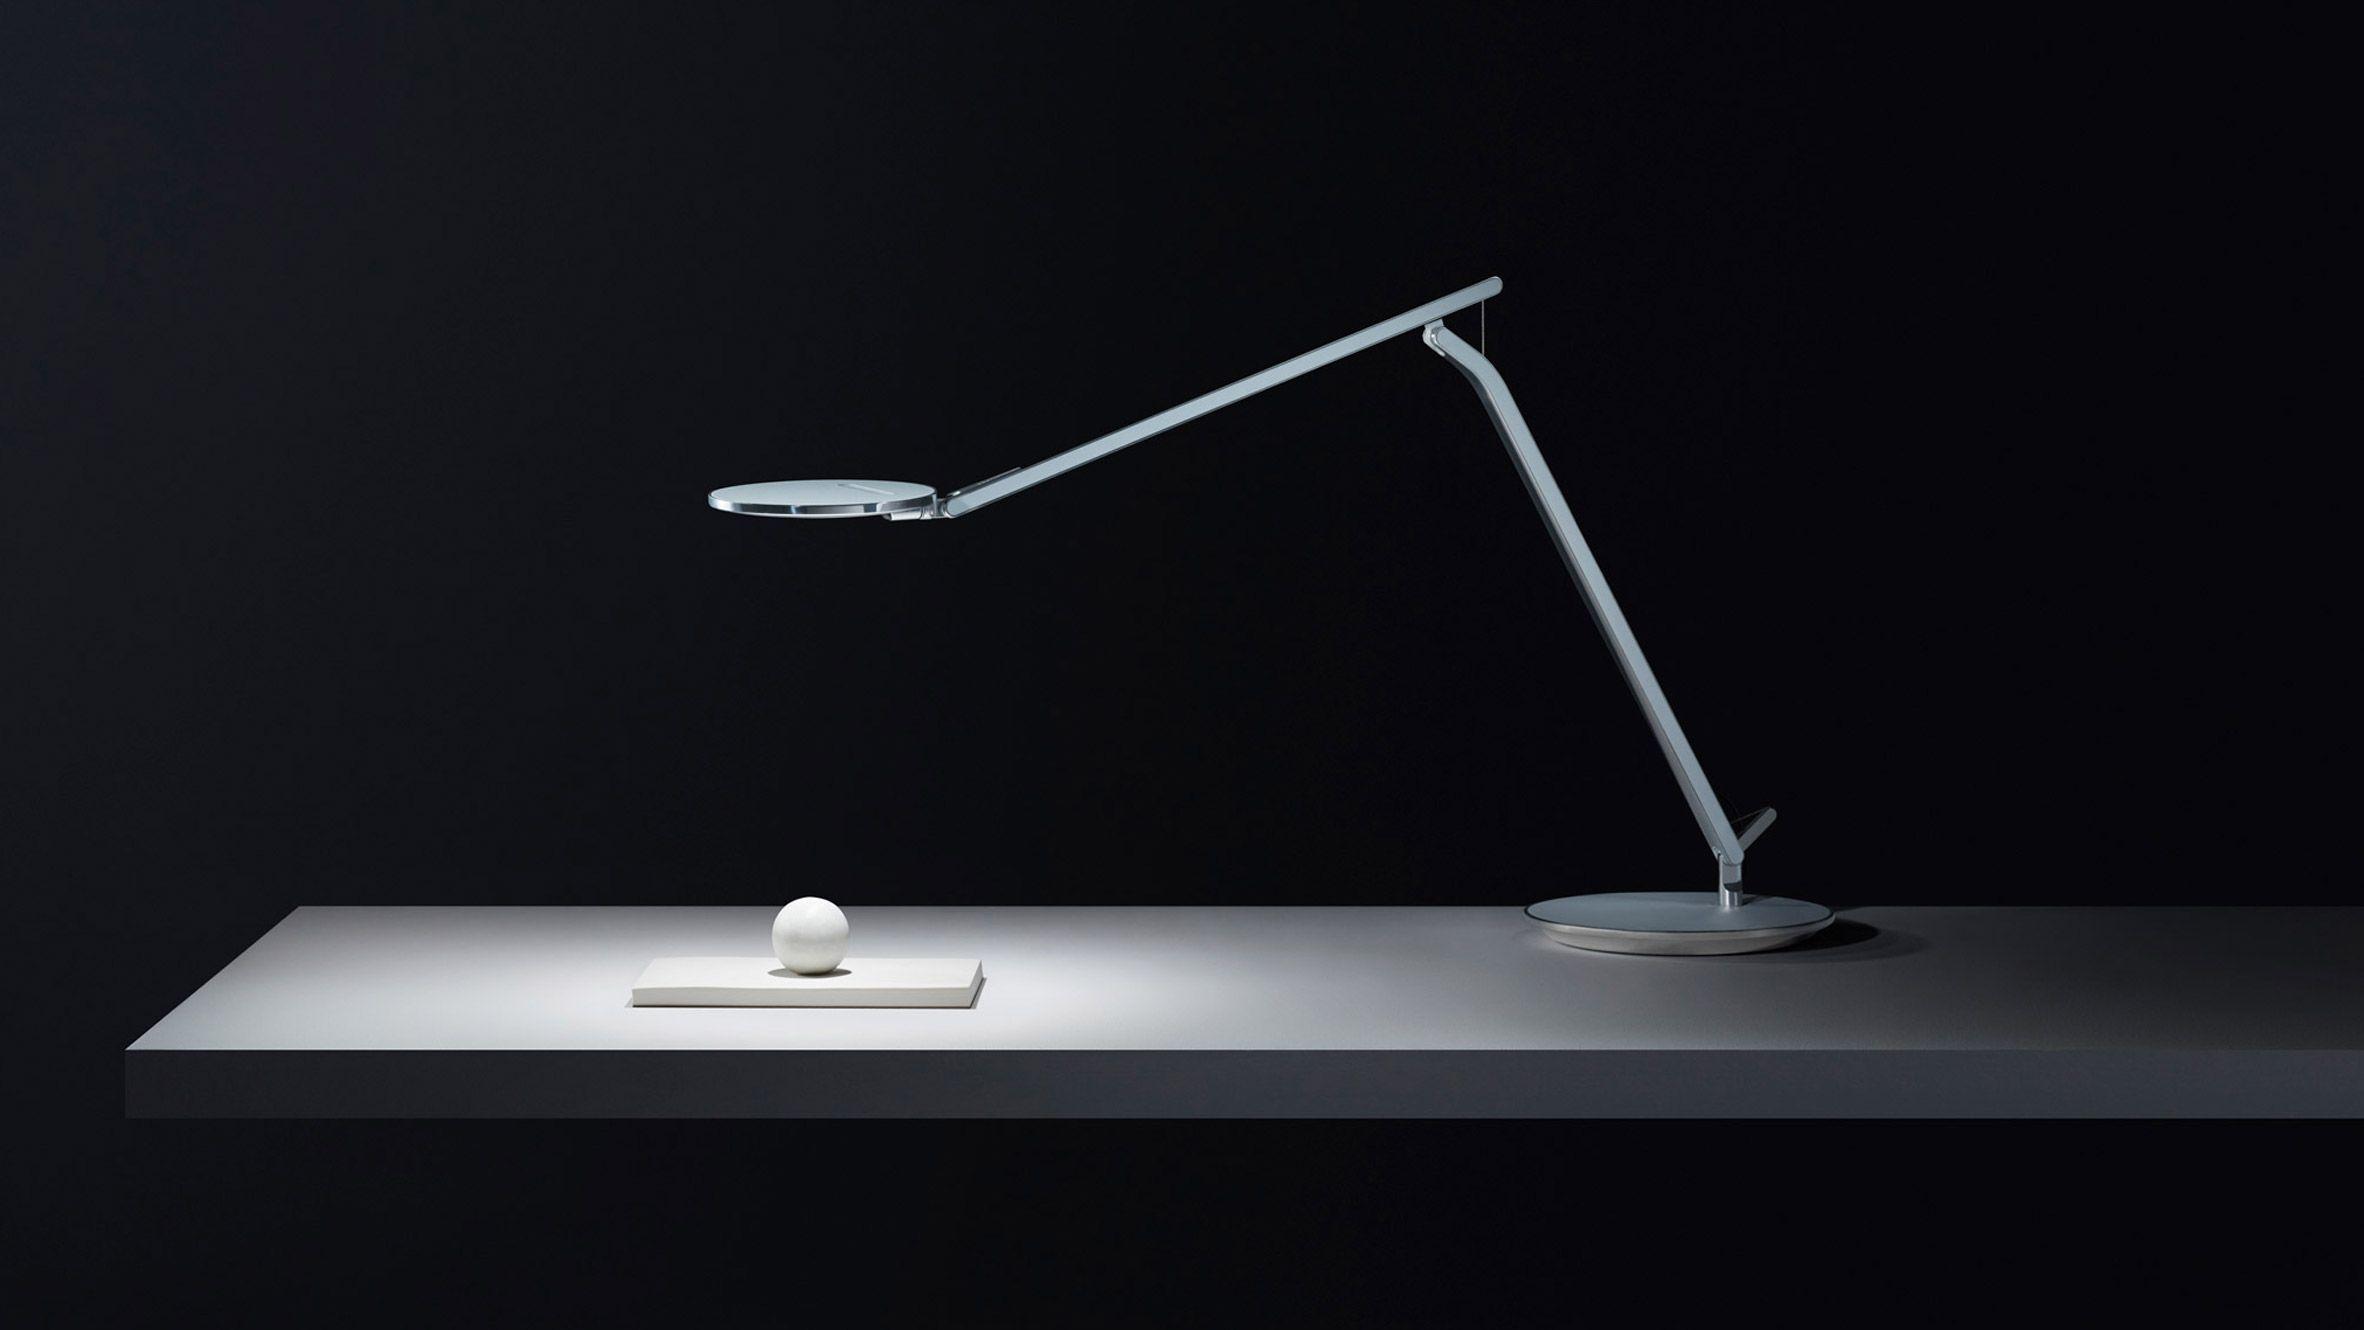 Humanscale S Infinity Lamp Designed To Combat Eyestrain From Screens Lamp Lamp Design Table Lamp Lighting